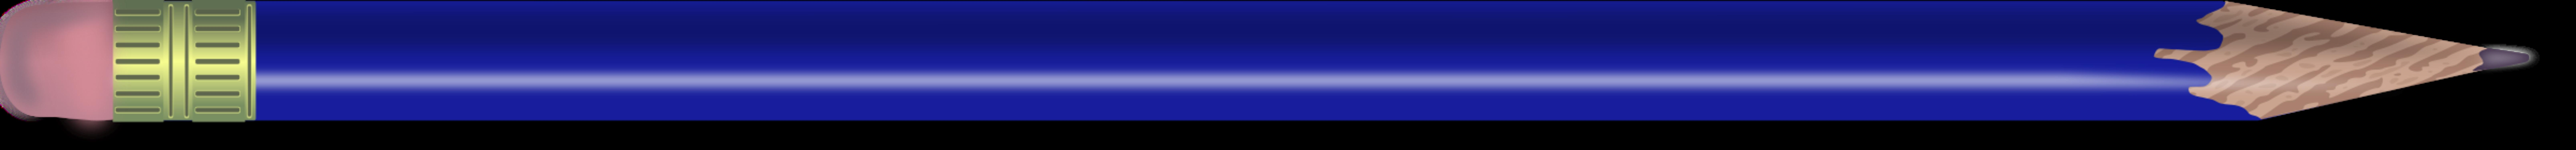 Blue,Angle,Text